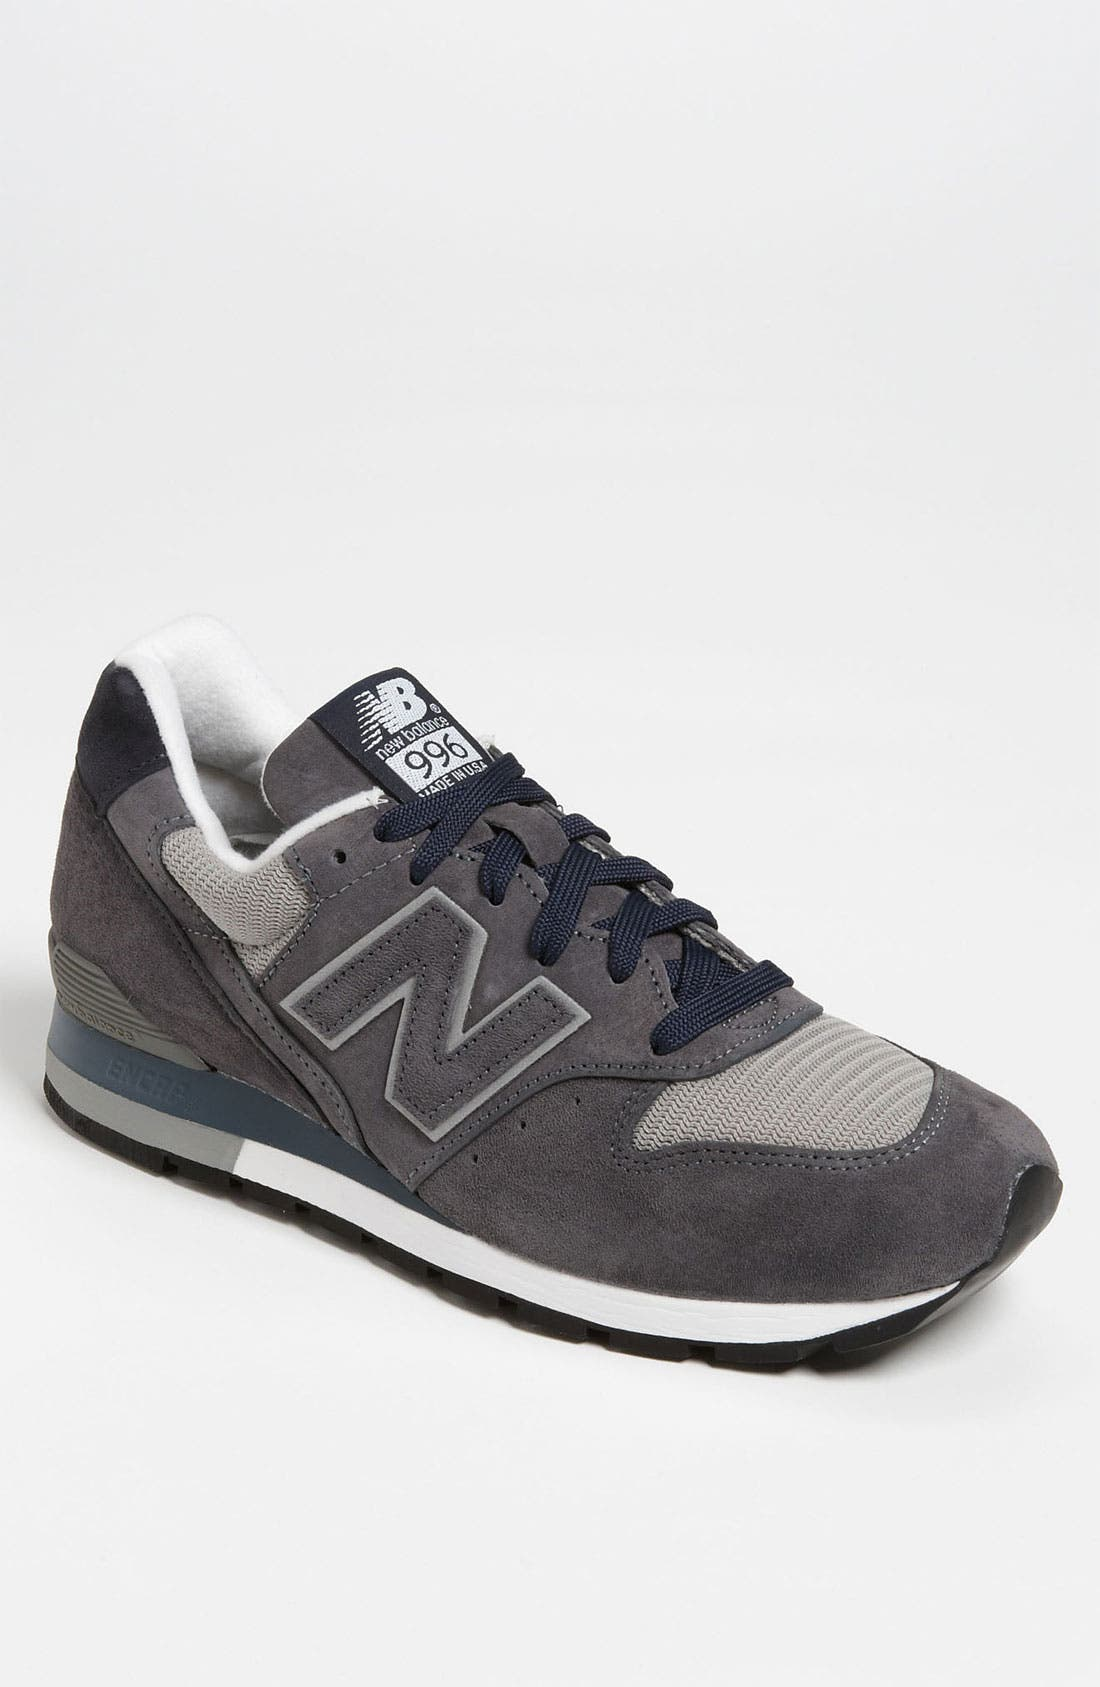 Main Image - New Balance '996' Sneaker (Men) (Online Only)